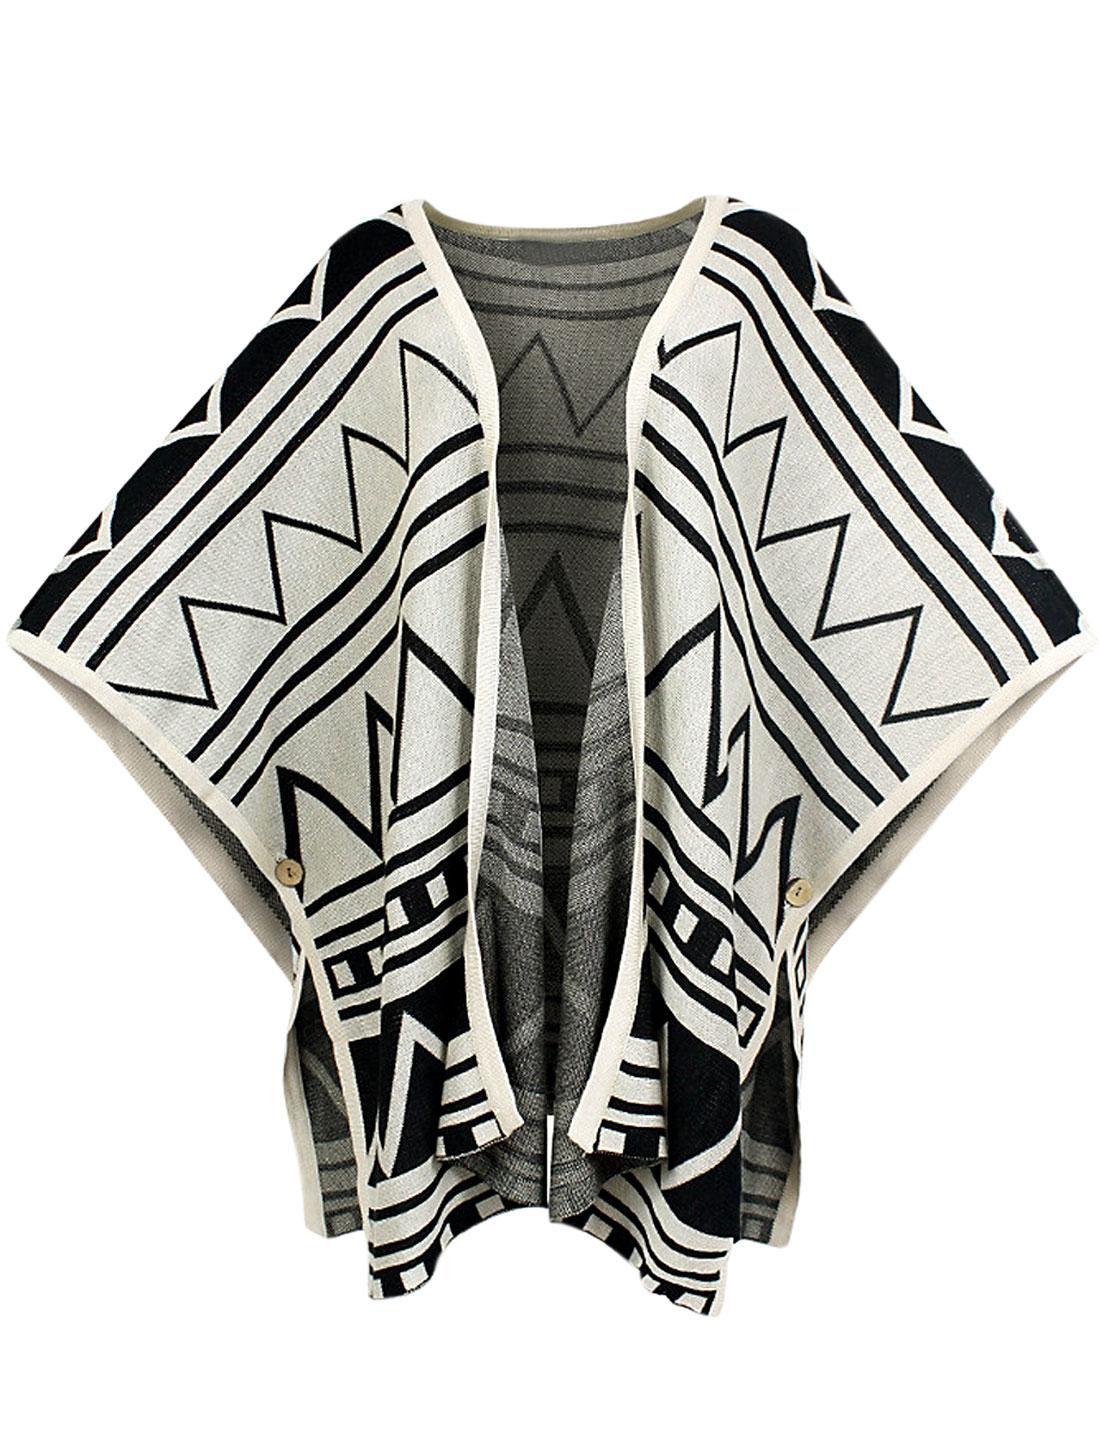 Lady Geometric Pattern Zig-Zag Design Cozy Fit Knit Cape Beige S